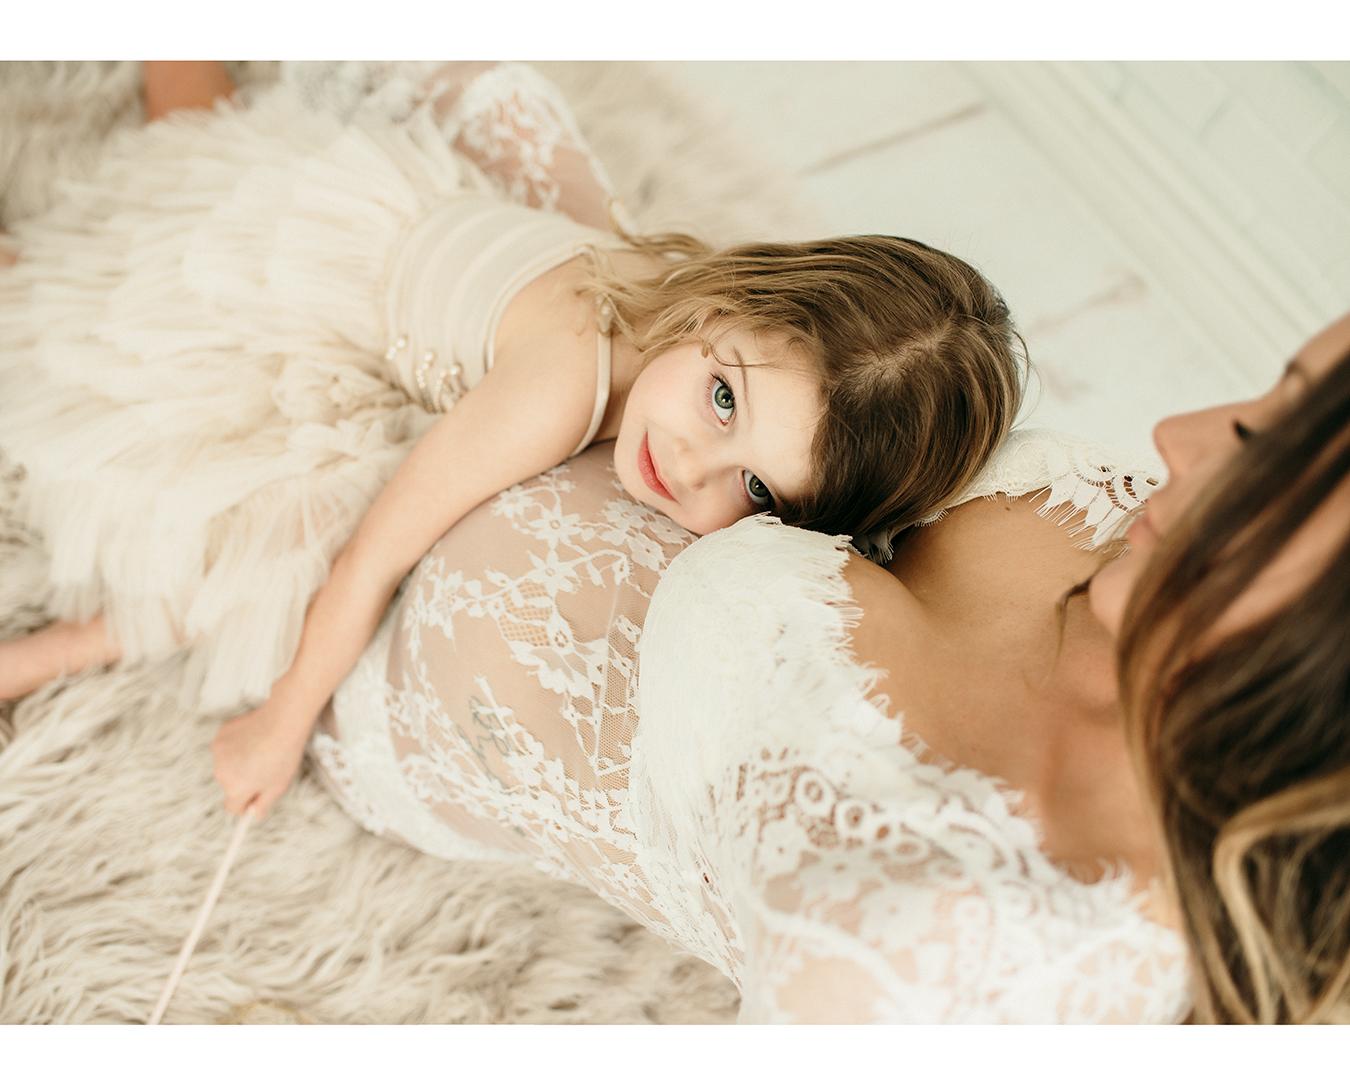 maternity photography anchorage ak